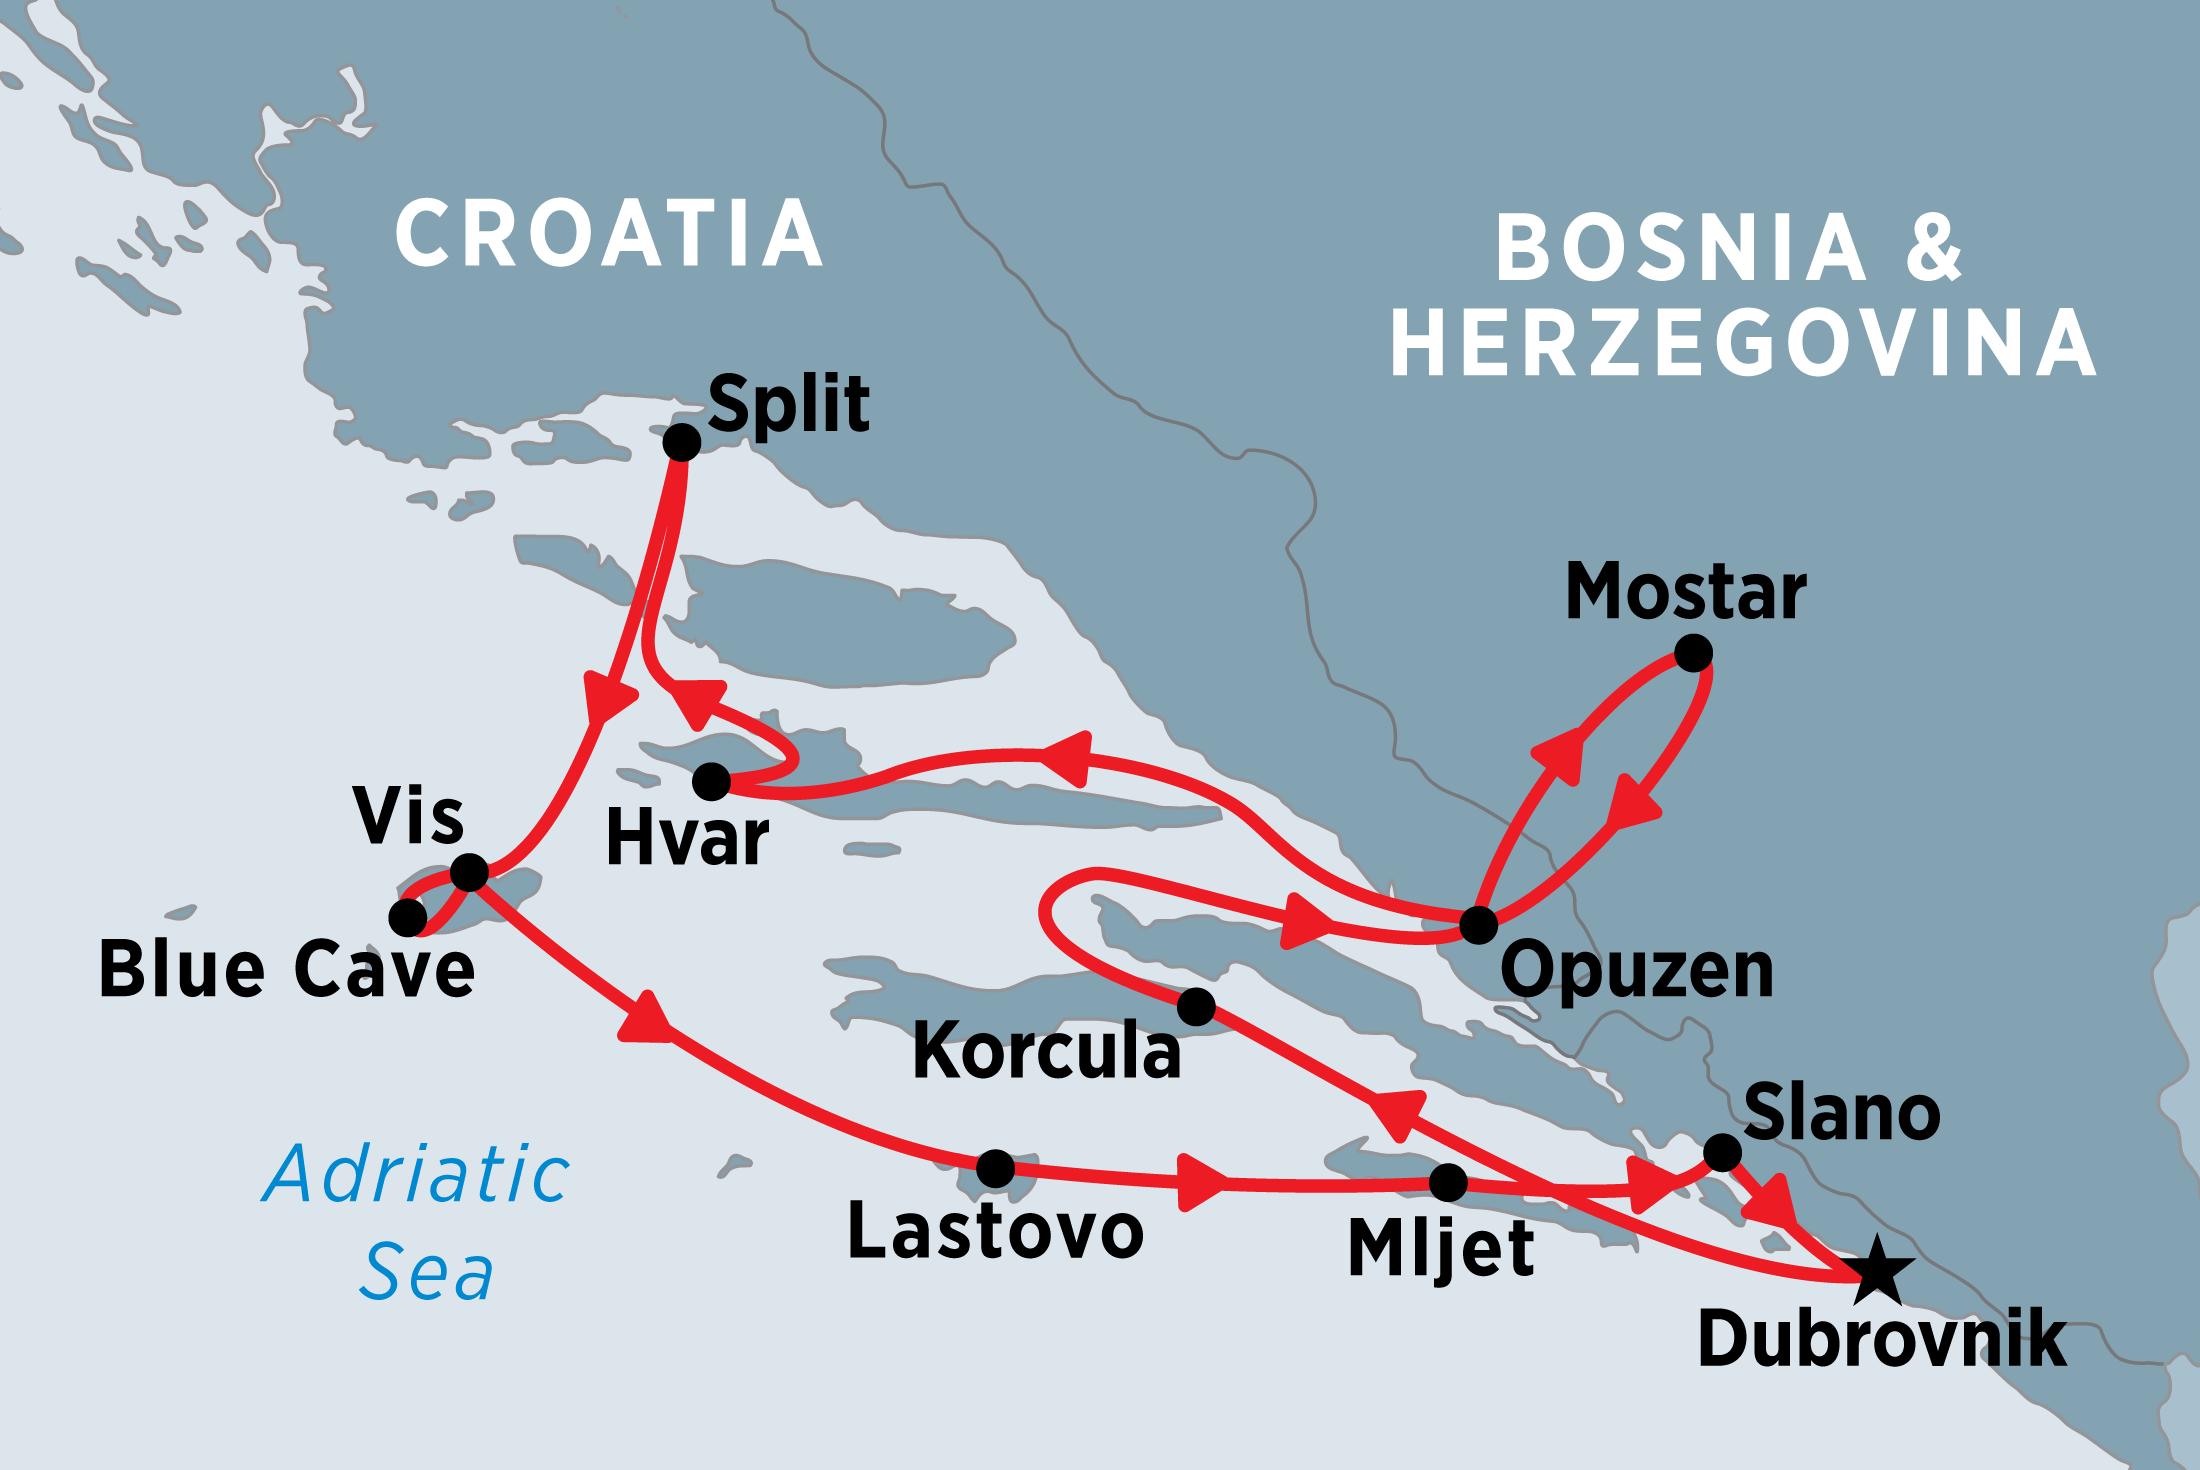 Bosnia & Herzegovina Tours   Peregrine Adventures US on croatia map, luxembourg map, eritrea map, bulgaria map, srebrenica massacre, monaco map, serbia map, austria map, iran map, bosnian war, vatican city map, turkey map, estonia map, albania map, slovakia map, slovenia map, republika srpska, macedonia map, hungary map, ukraine map, kosovo map, republic of macedonia, san marino map,